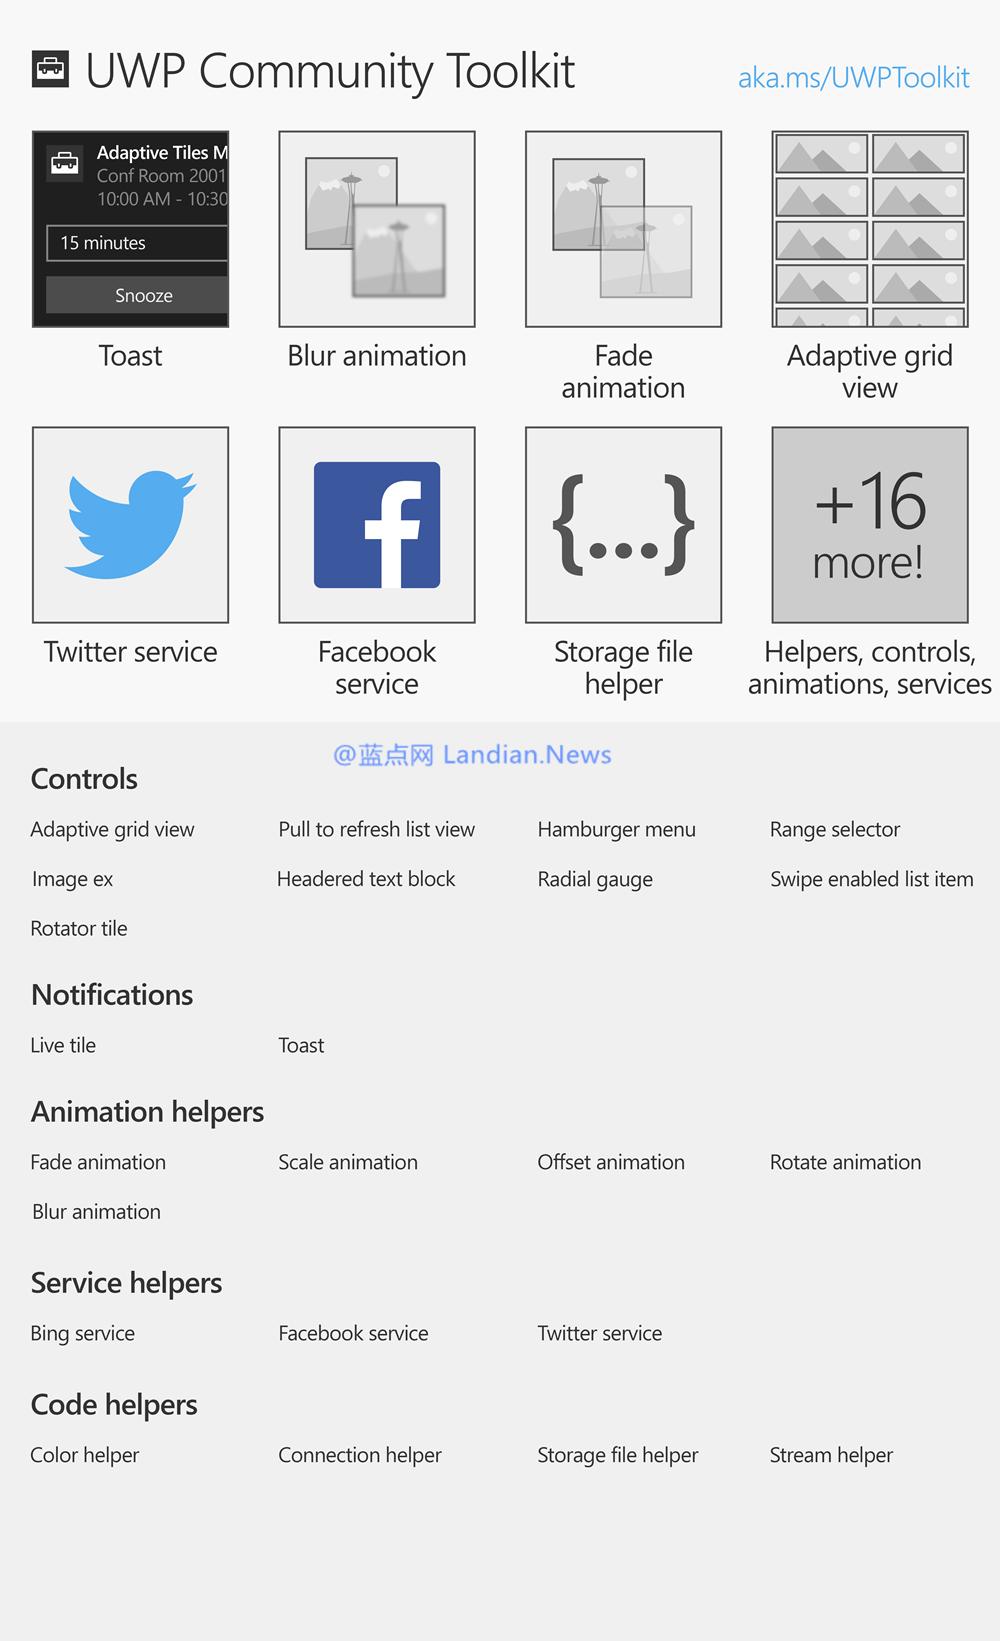 上线以来的首次更新:UWP Community Toolkit v1.1版发布